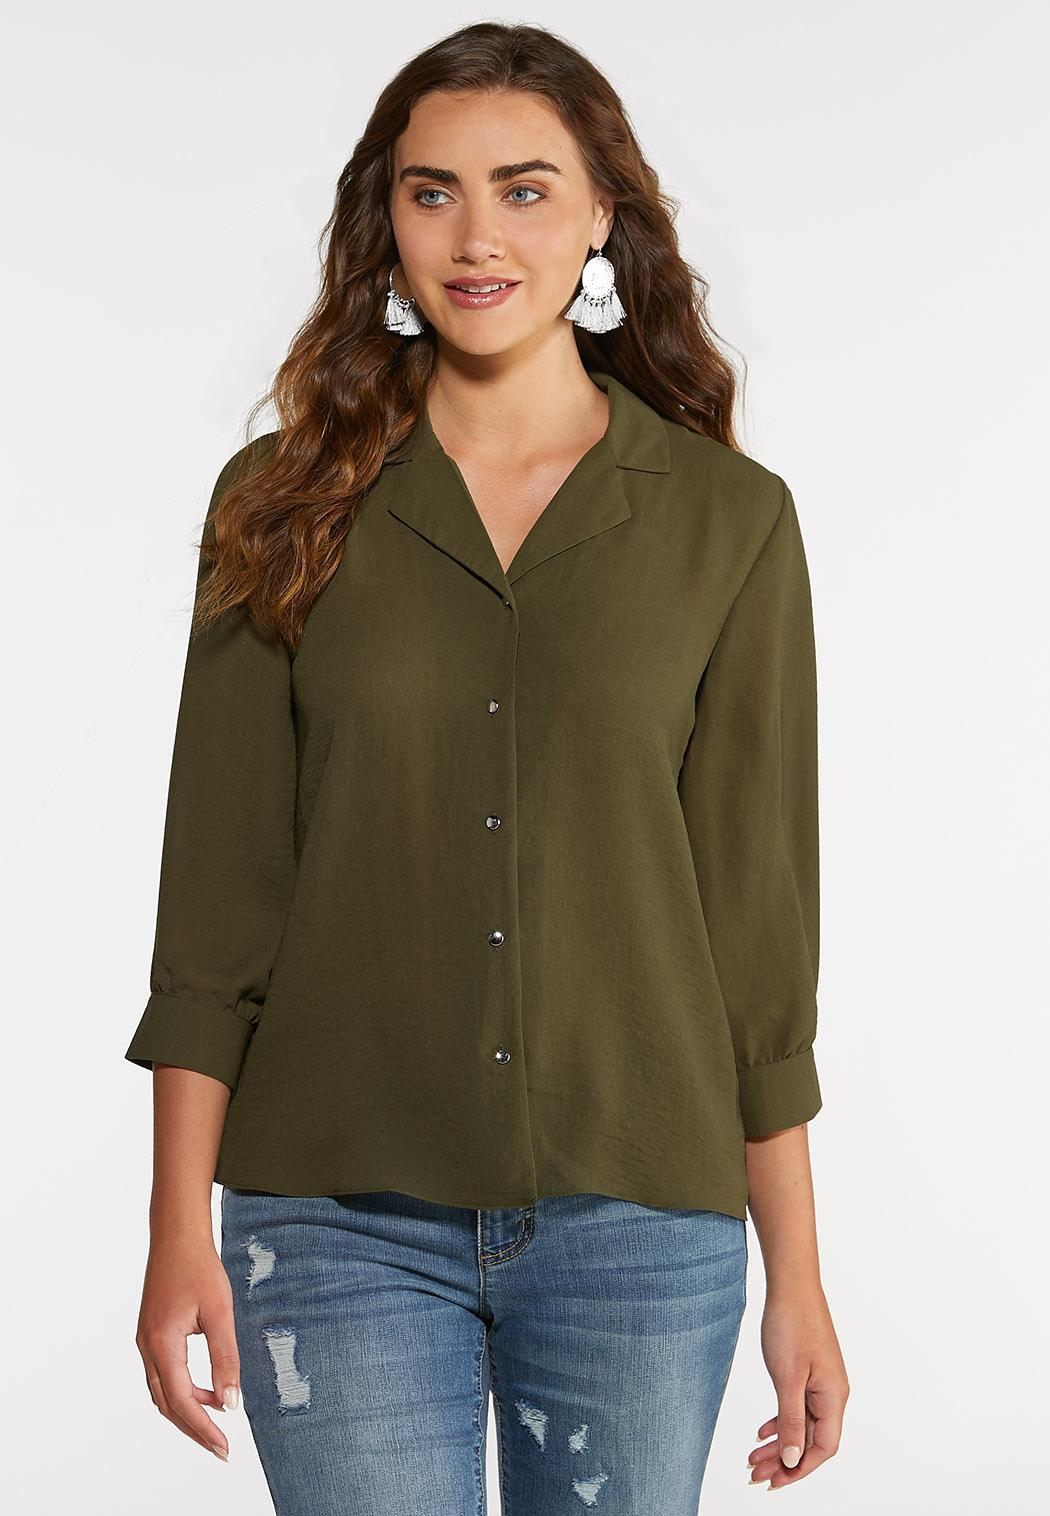 Plus Size Olive Button Down Shirt